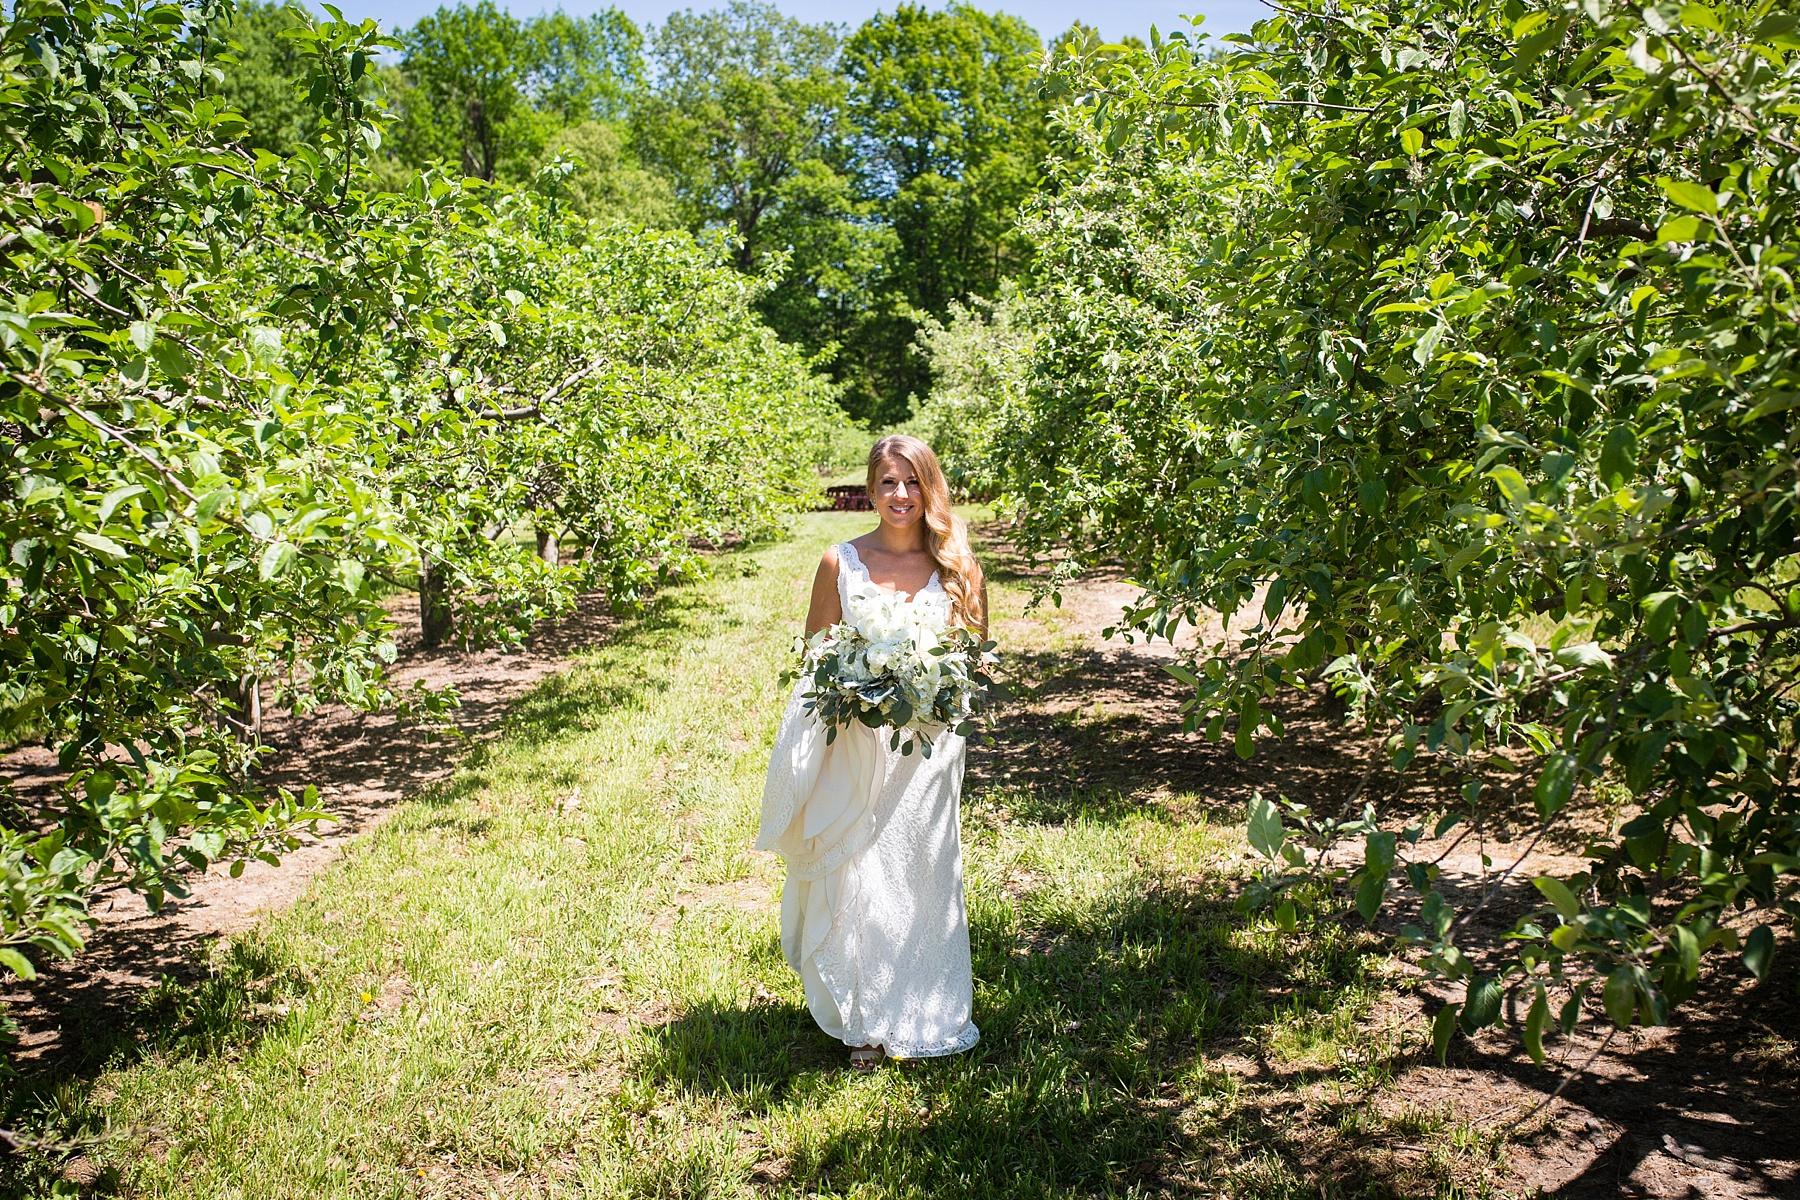 Brandon_Shafer_Photography_Kara_Doug_12_corners_Wedding_Benton_Harbor_0021.jpg